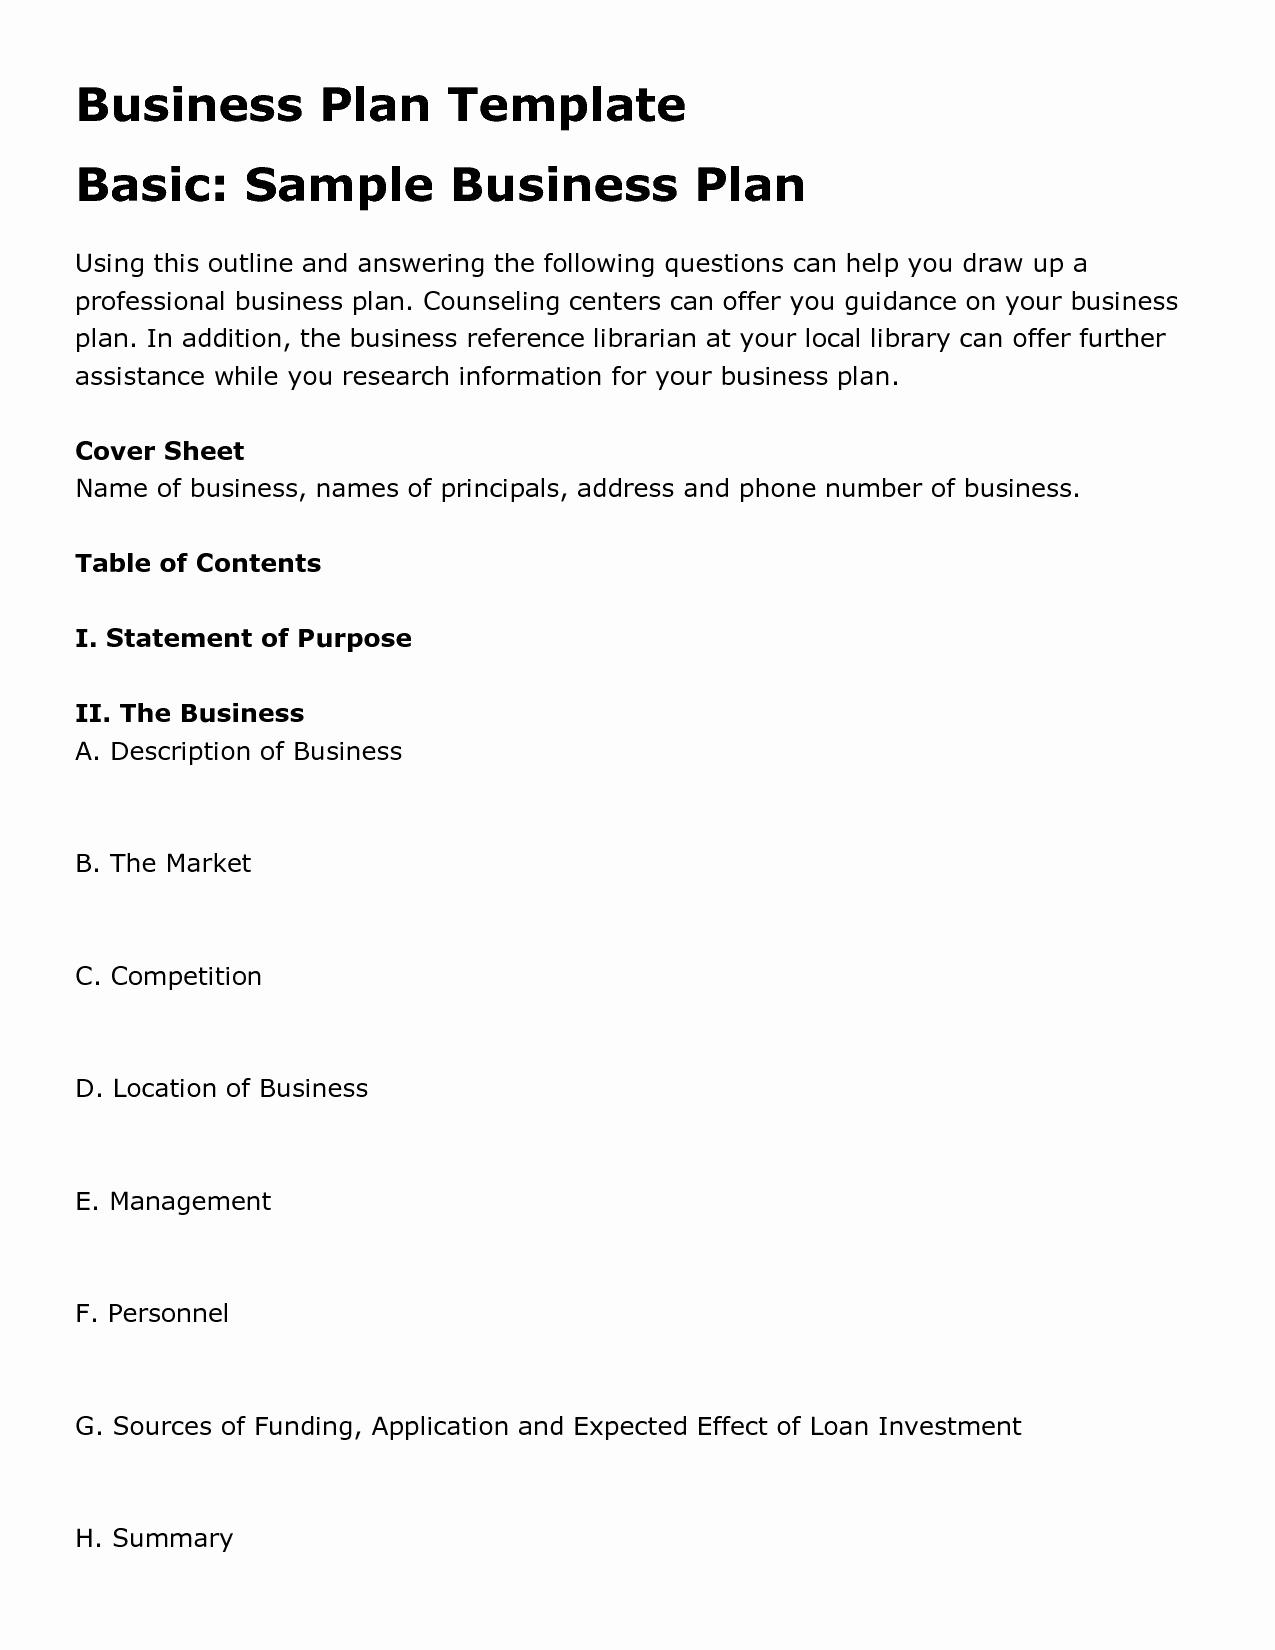 Sample Business Plan Templates Free Beautiful Free Printable Business Plan Template form Generic